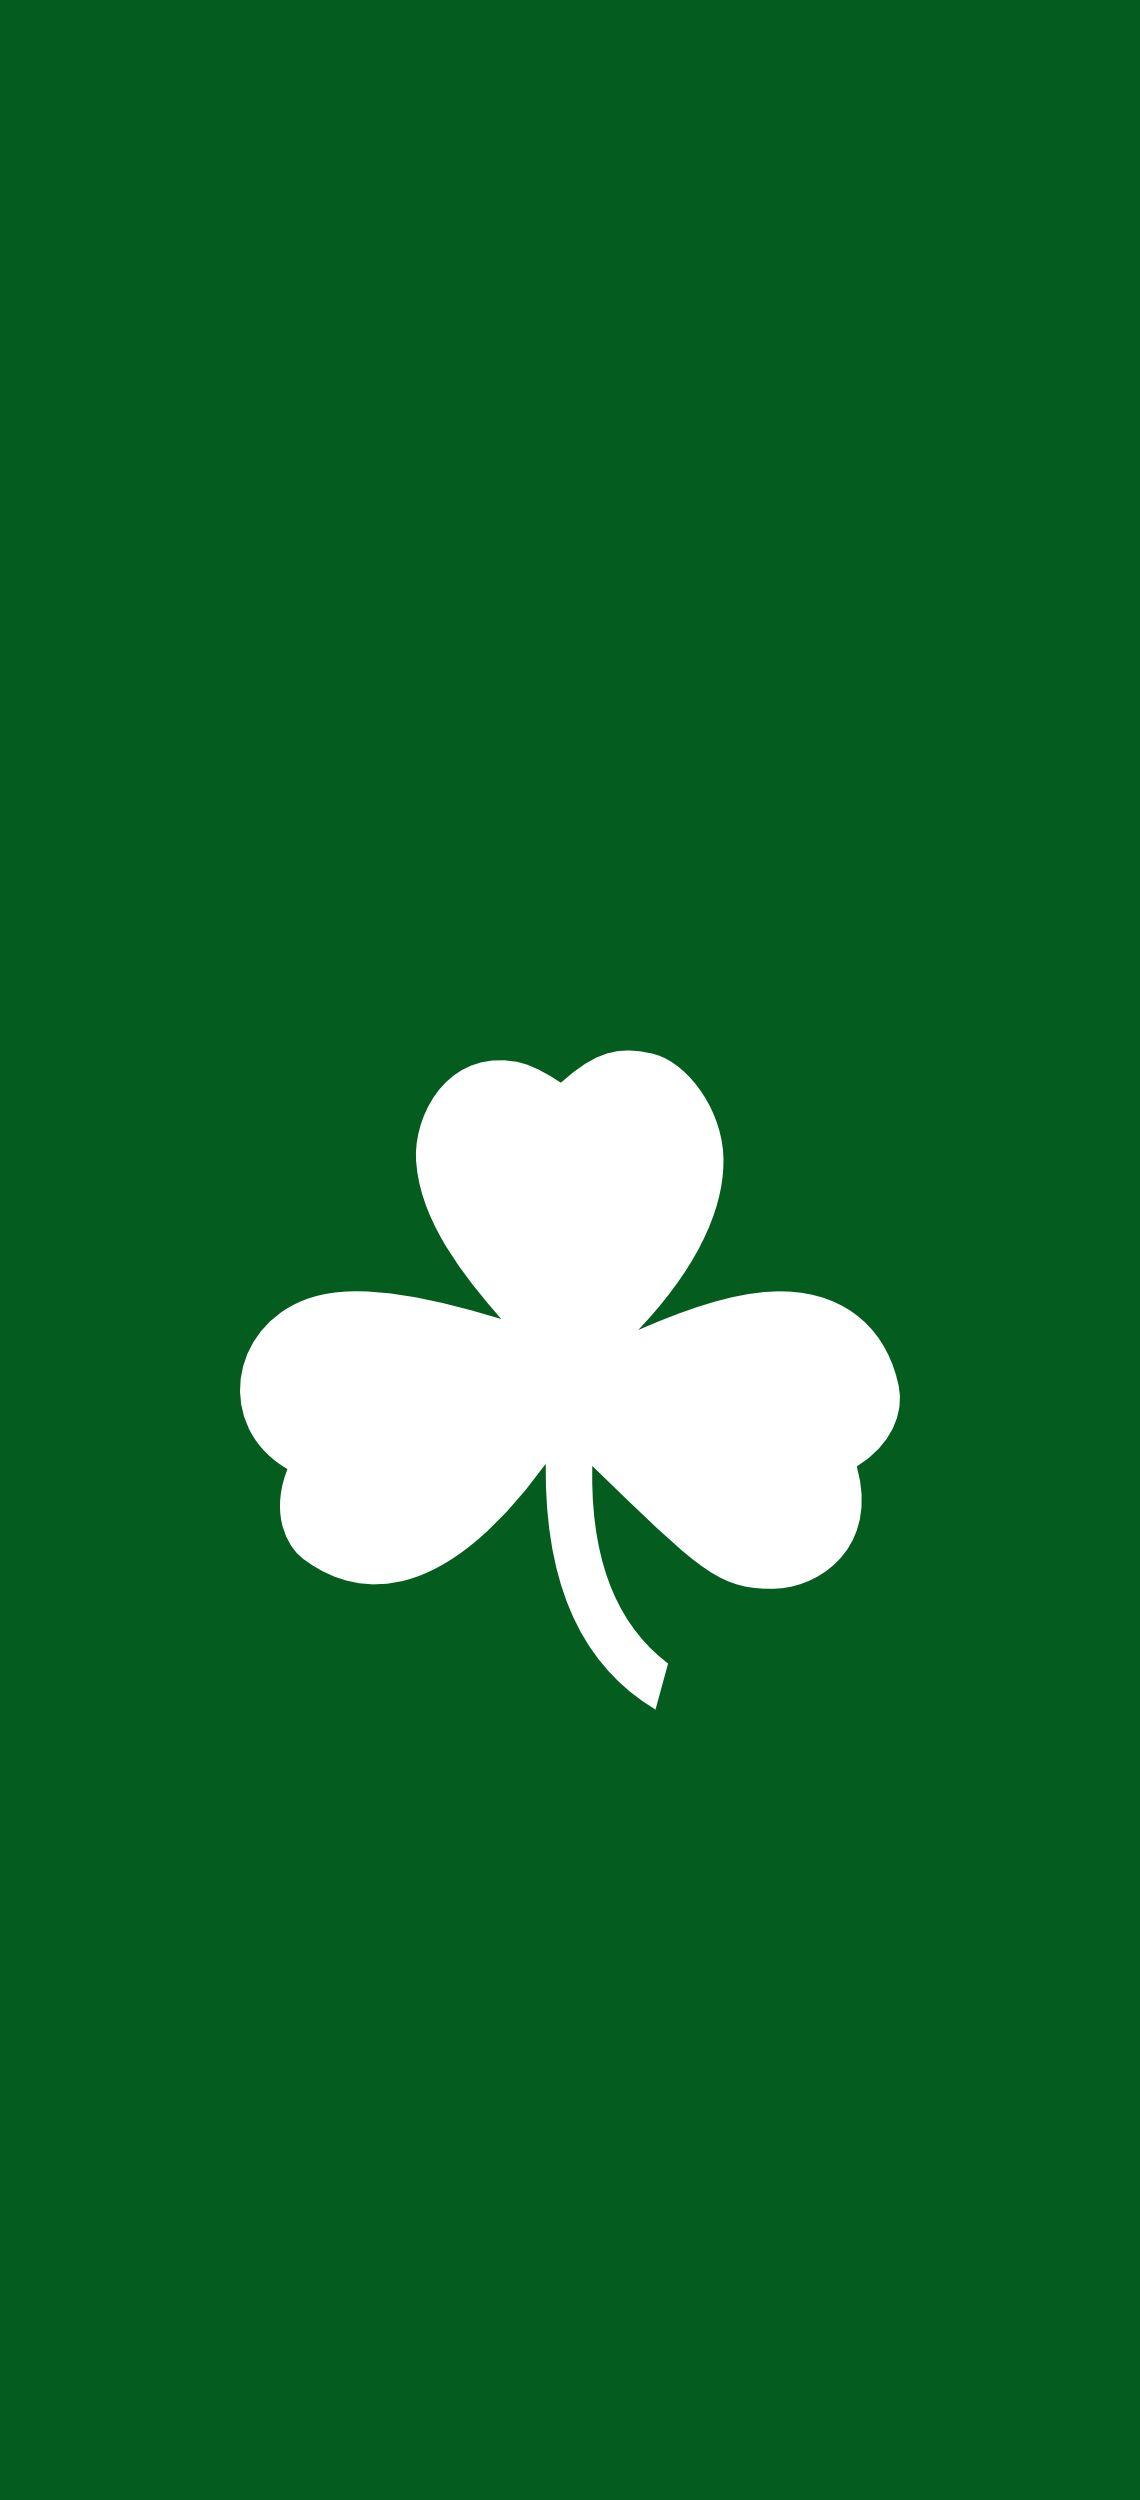 Pin By Shawn On Sports Boston Celtics Boston Celtics Basketball